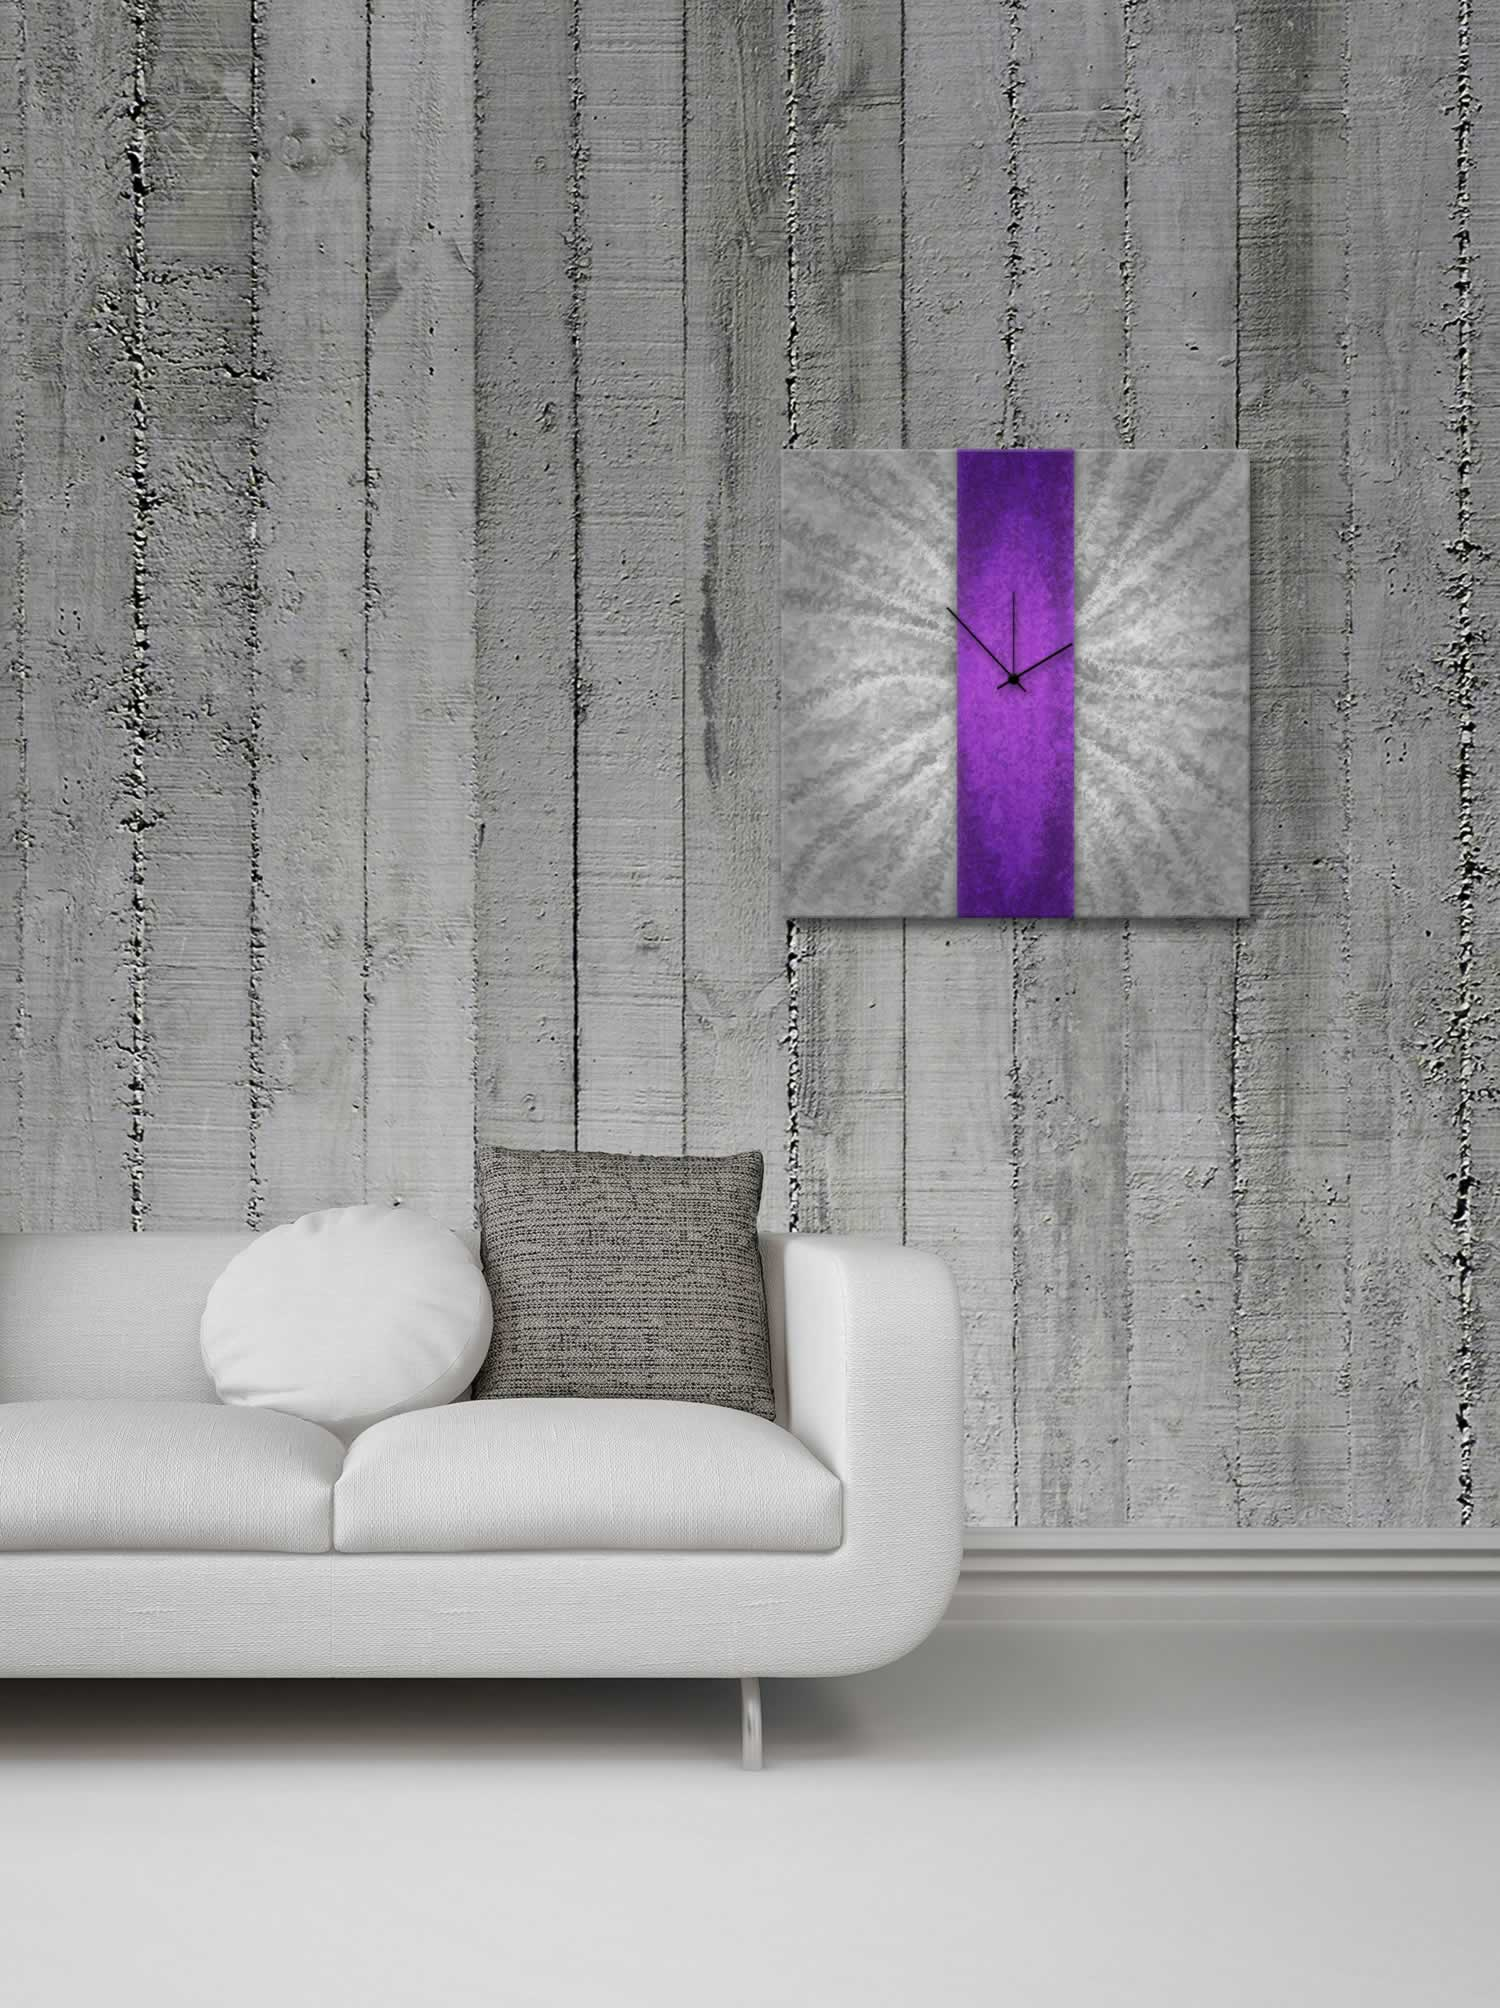 Violet Stripe Clock - Contemporary Metal Wall Clock - Lifestyle Image